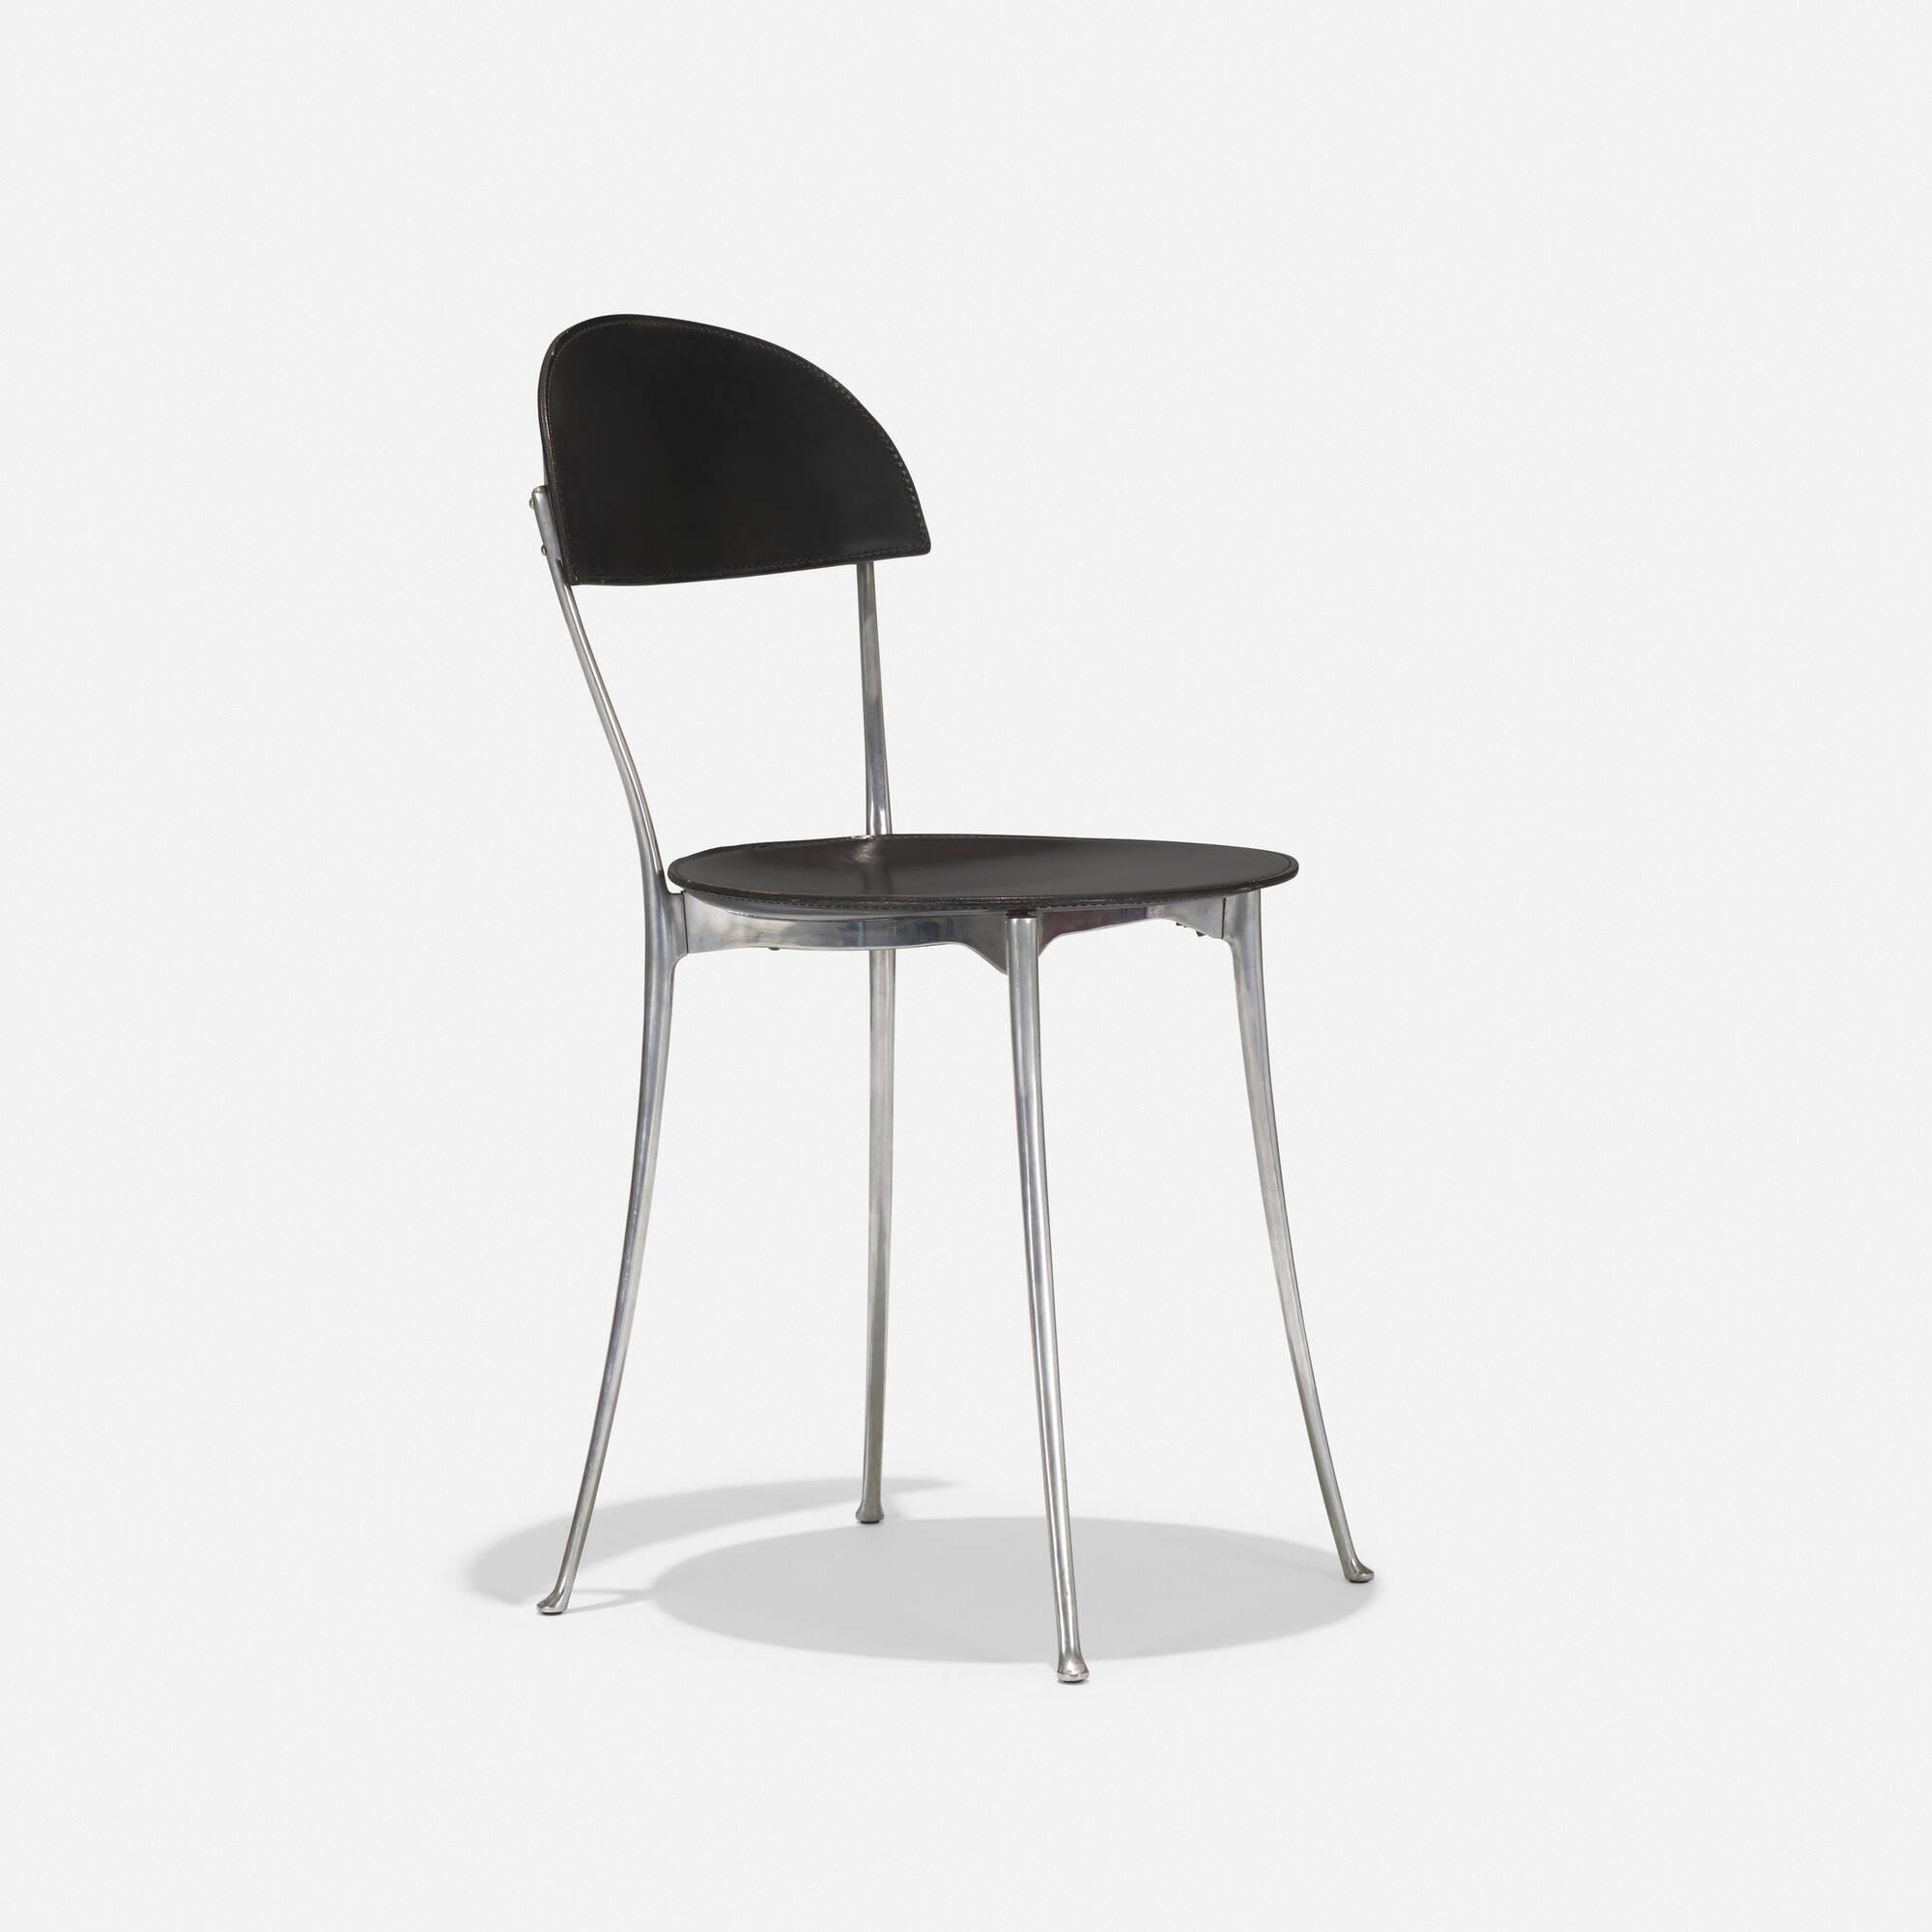 418: Enzo Mari / Tonietta chair (1 of 4)